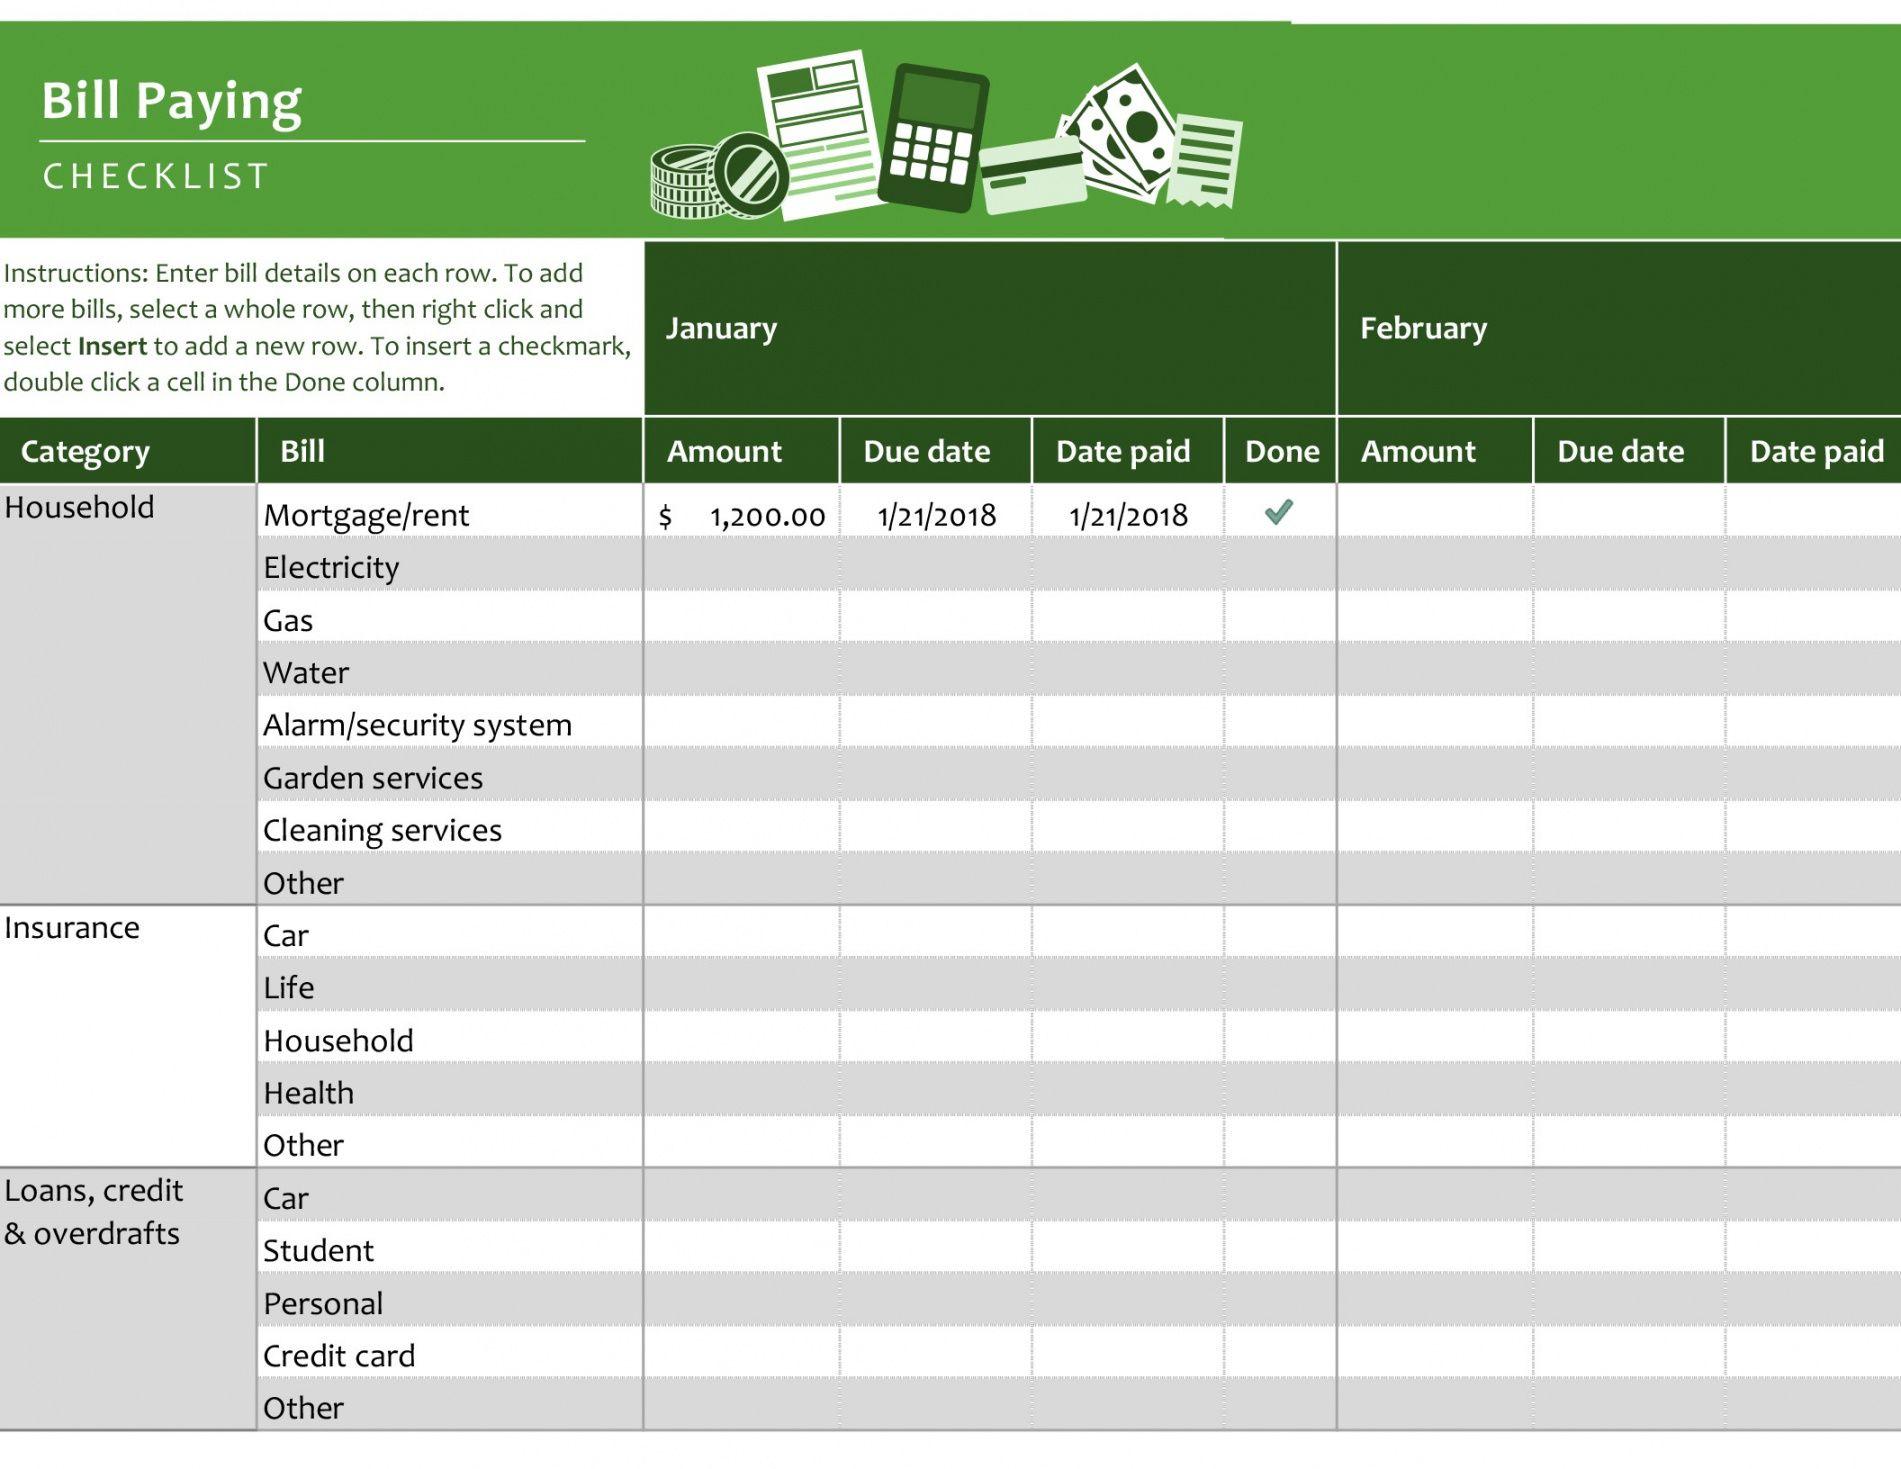 accounts payable audit checklist go live setup dynamics 365foax accounts payable checklist template excel